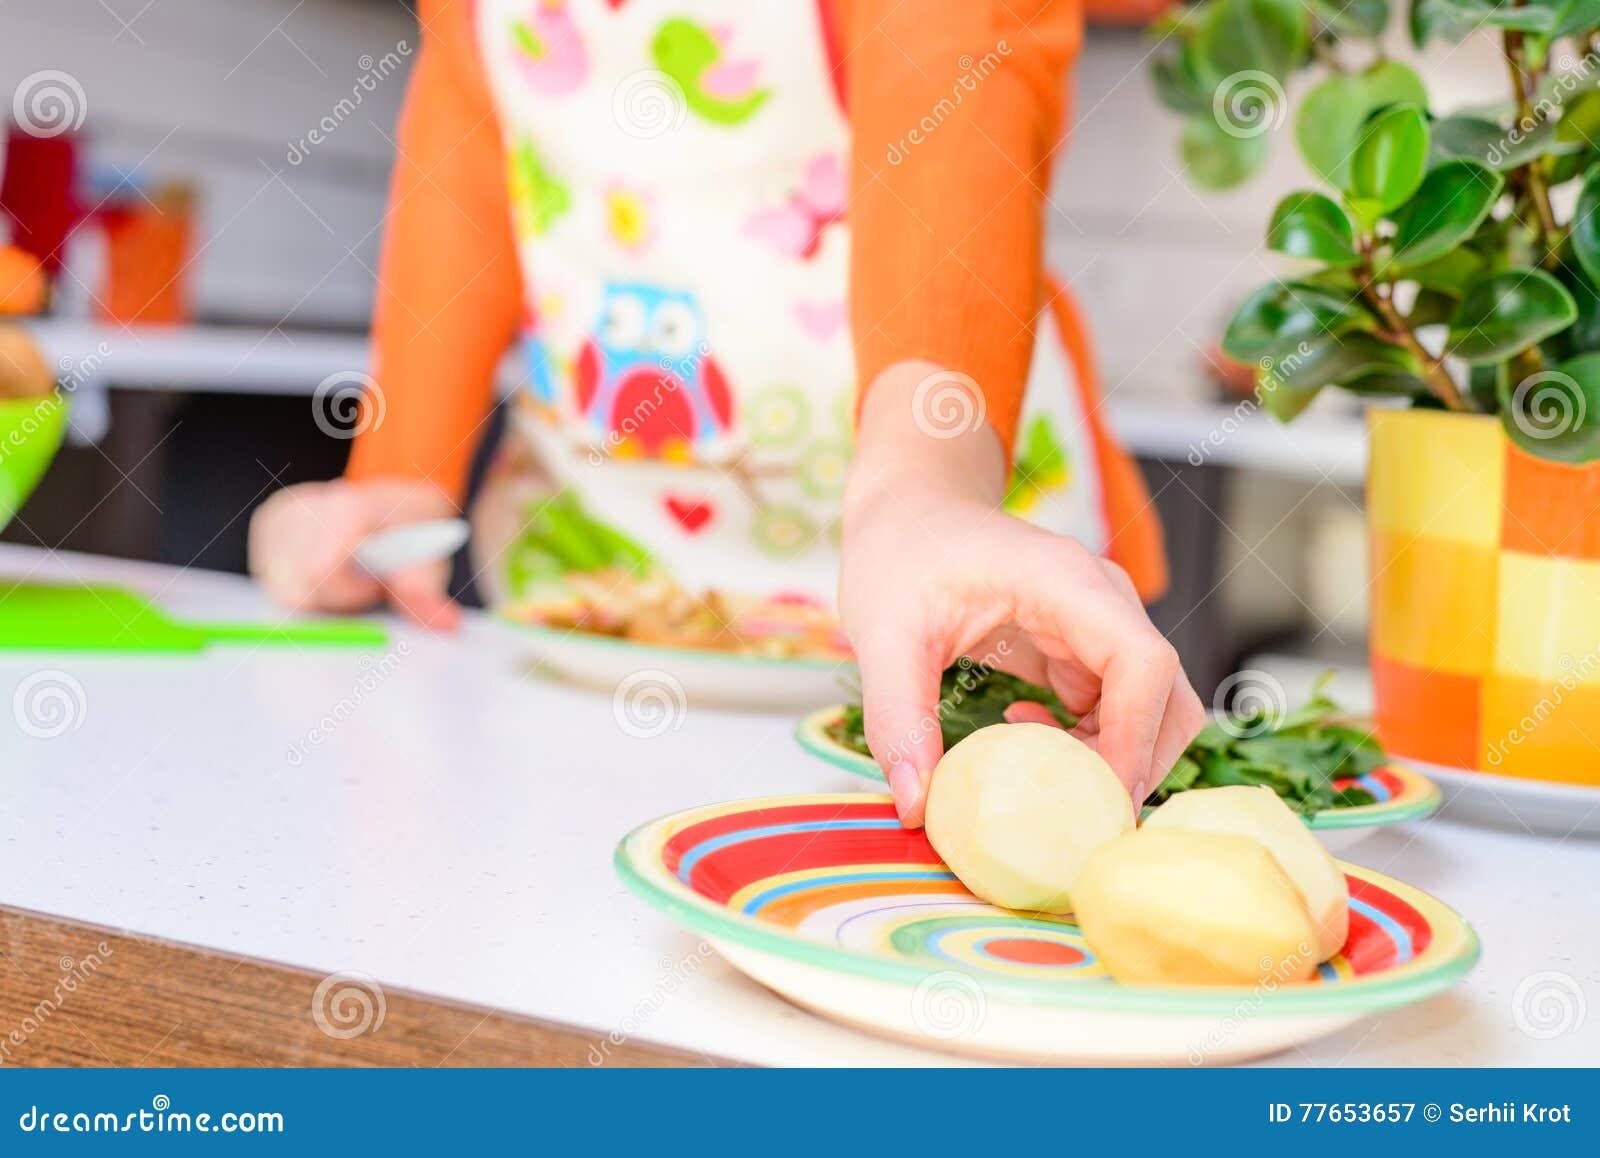 Woman grab peeled potato by hand,in modern kitchen